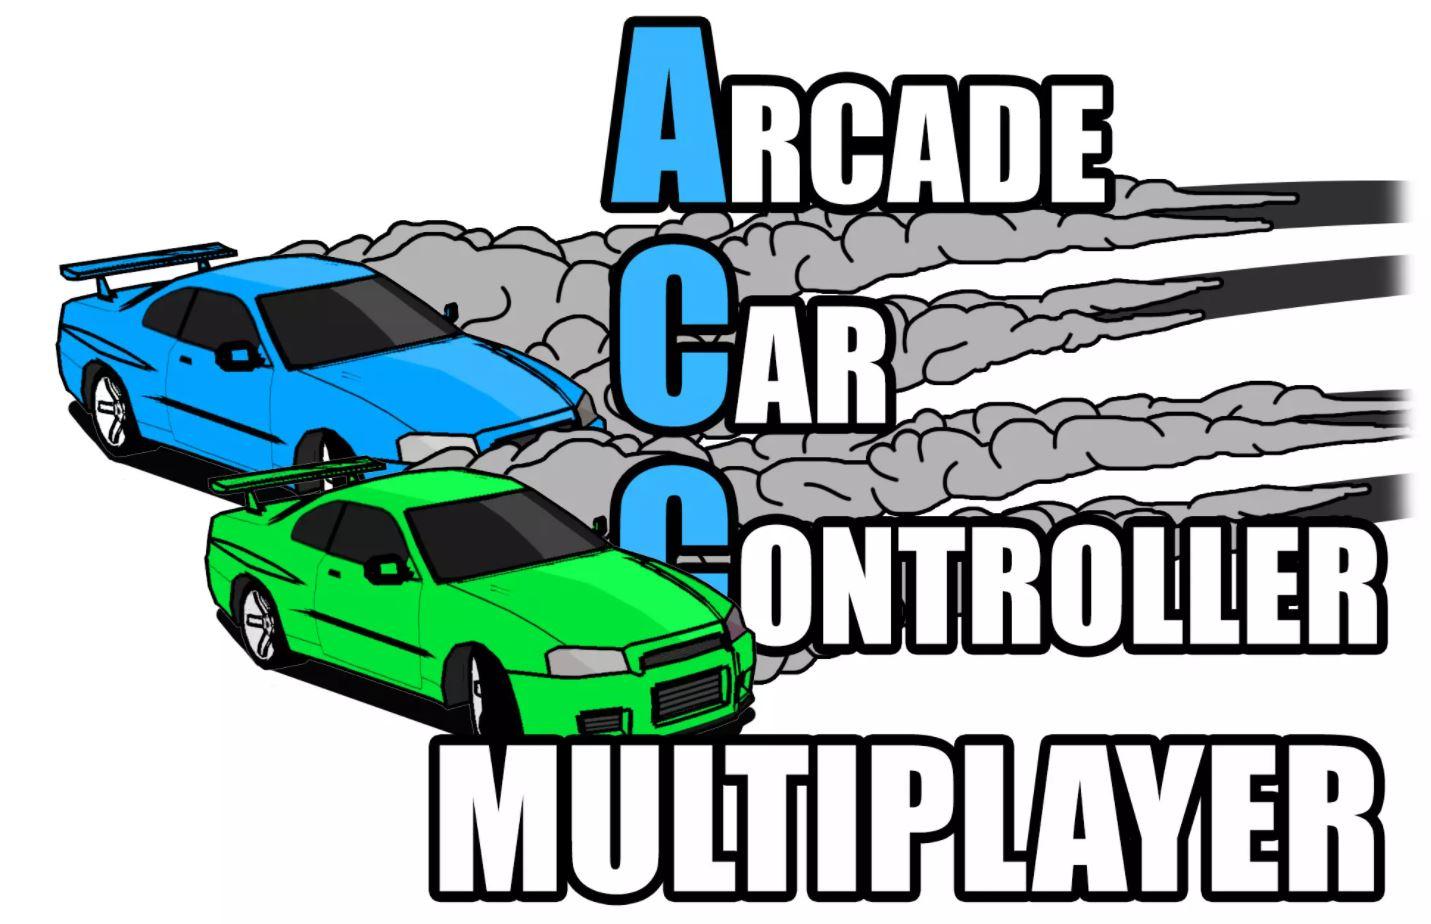 Arcade Car Controller Multiplayer incelemesi